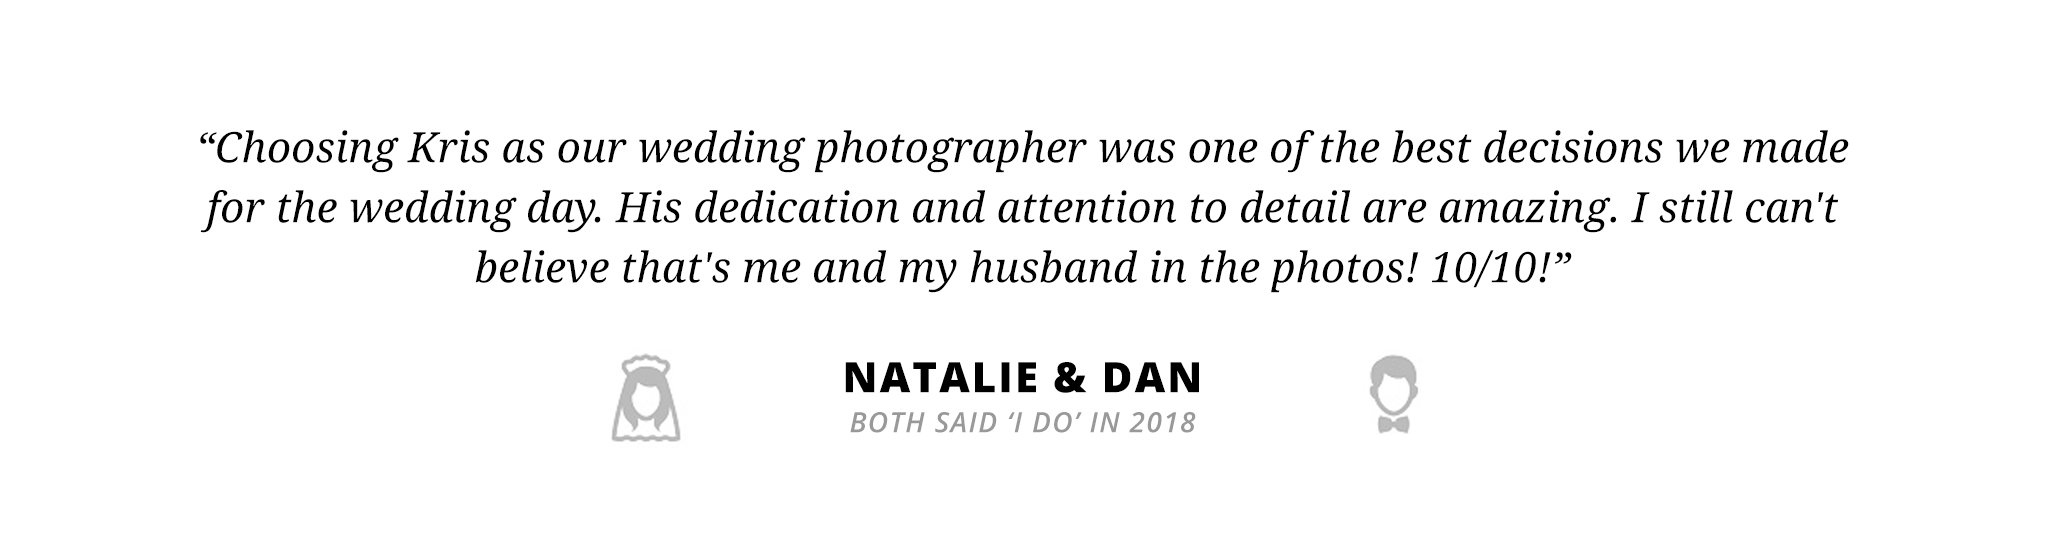 Wedding-Testimonials-Natalie-Dan.jpg